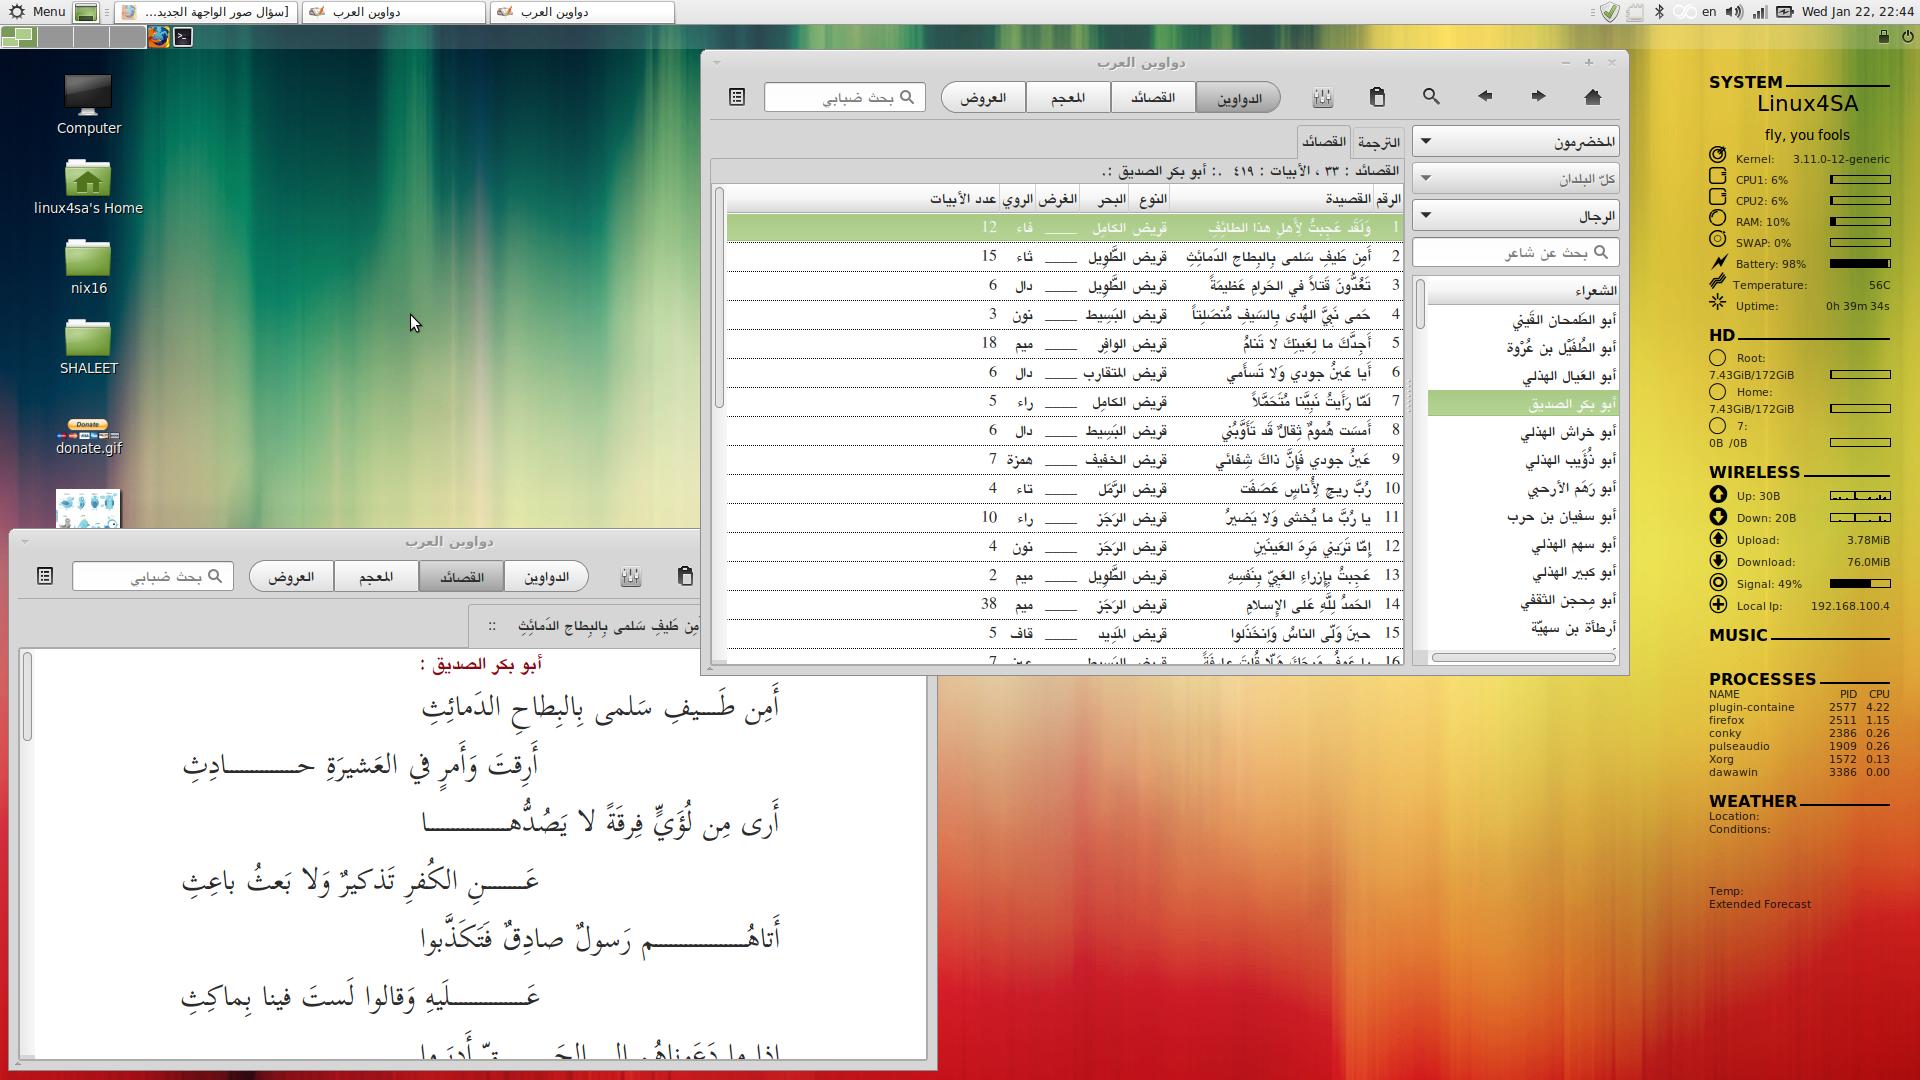 Linux Dawawin by Linux4SA